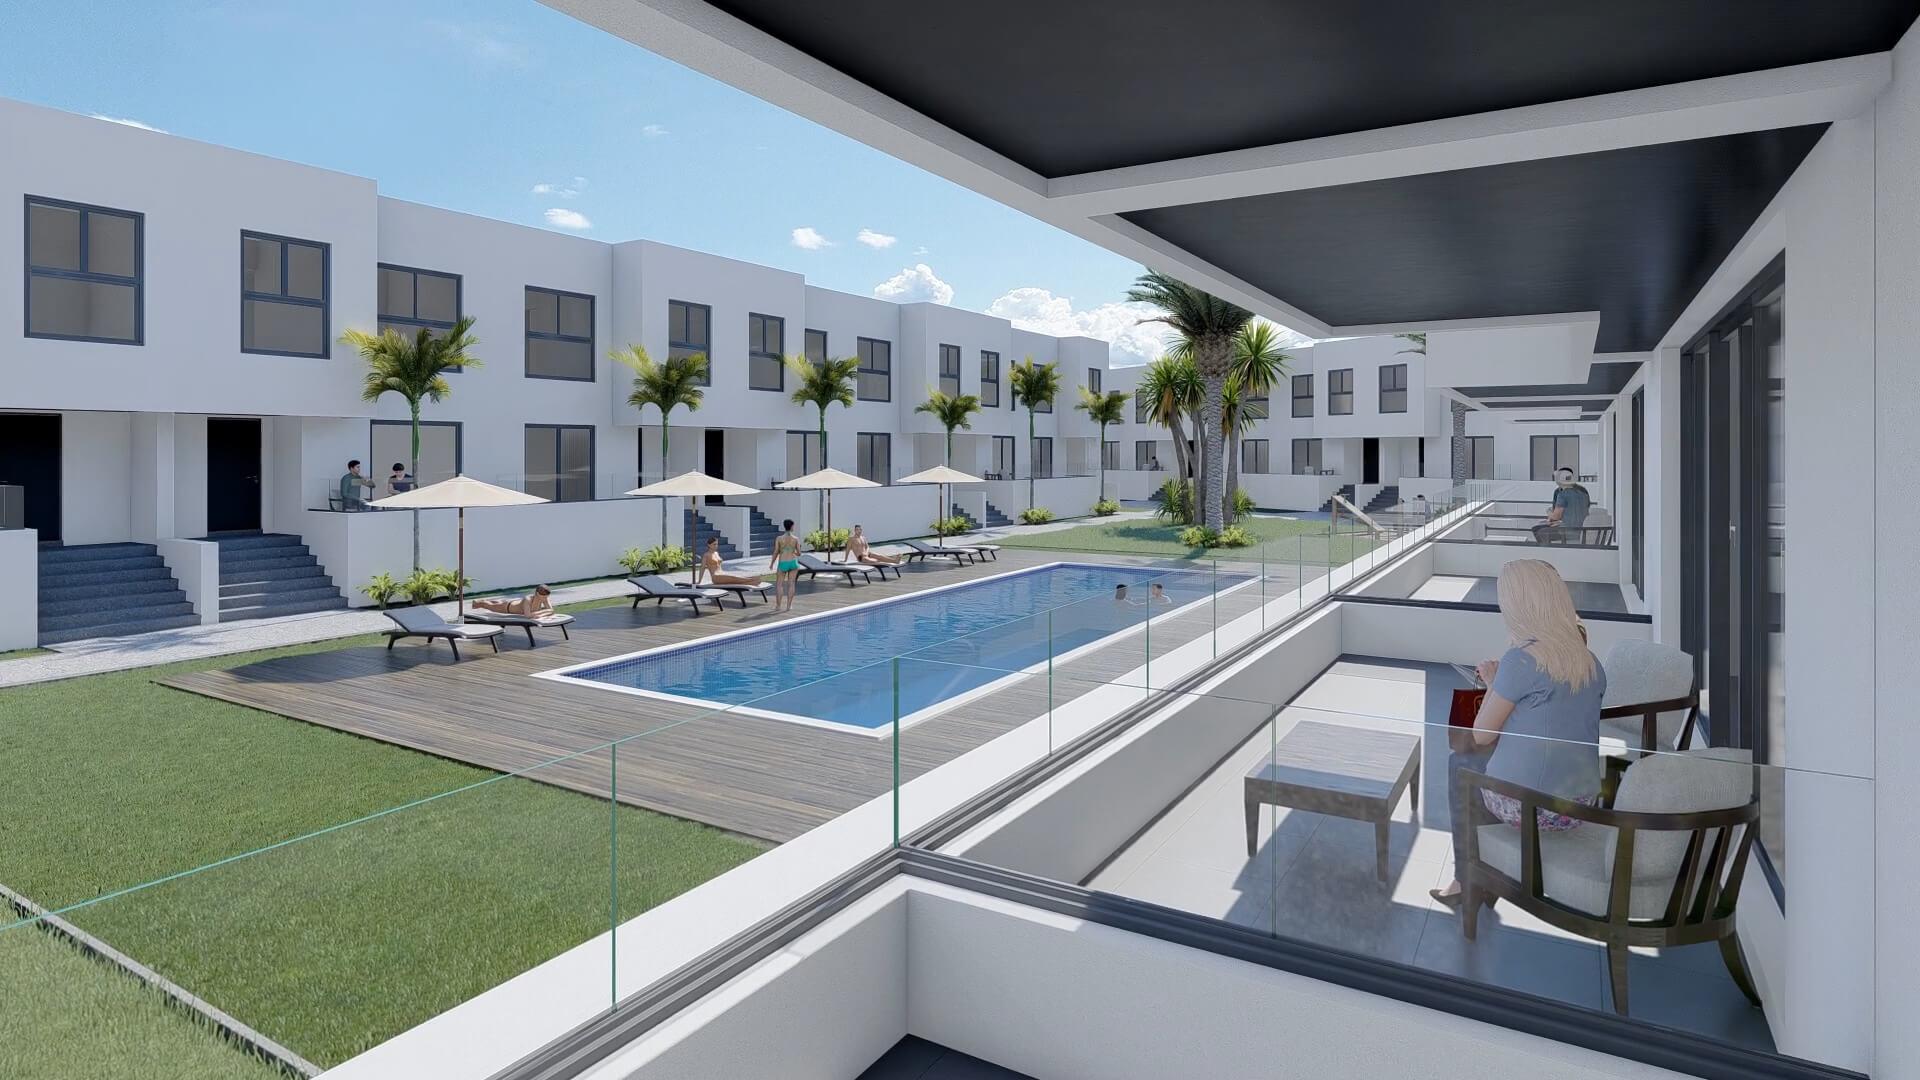 Terraza y piscina Portobello